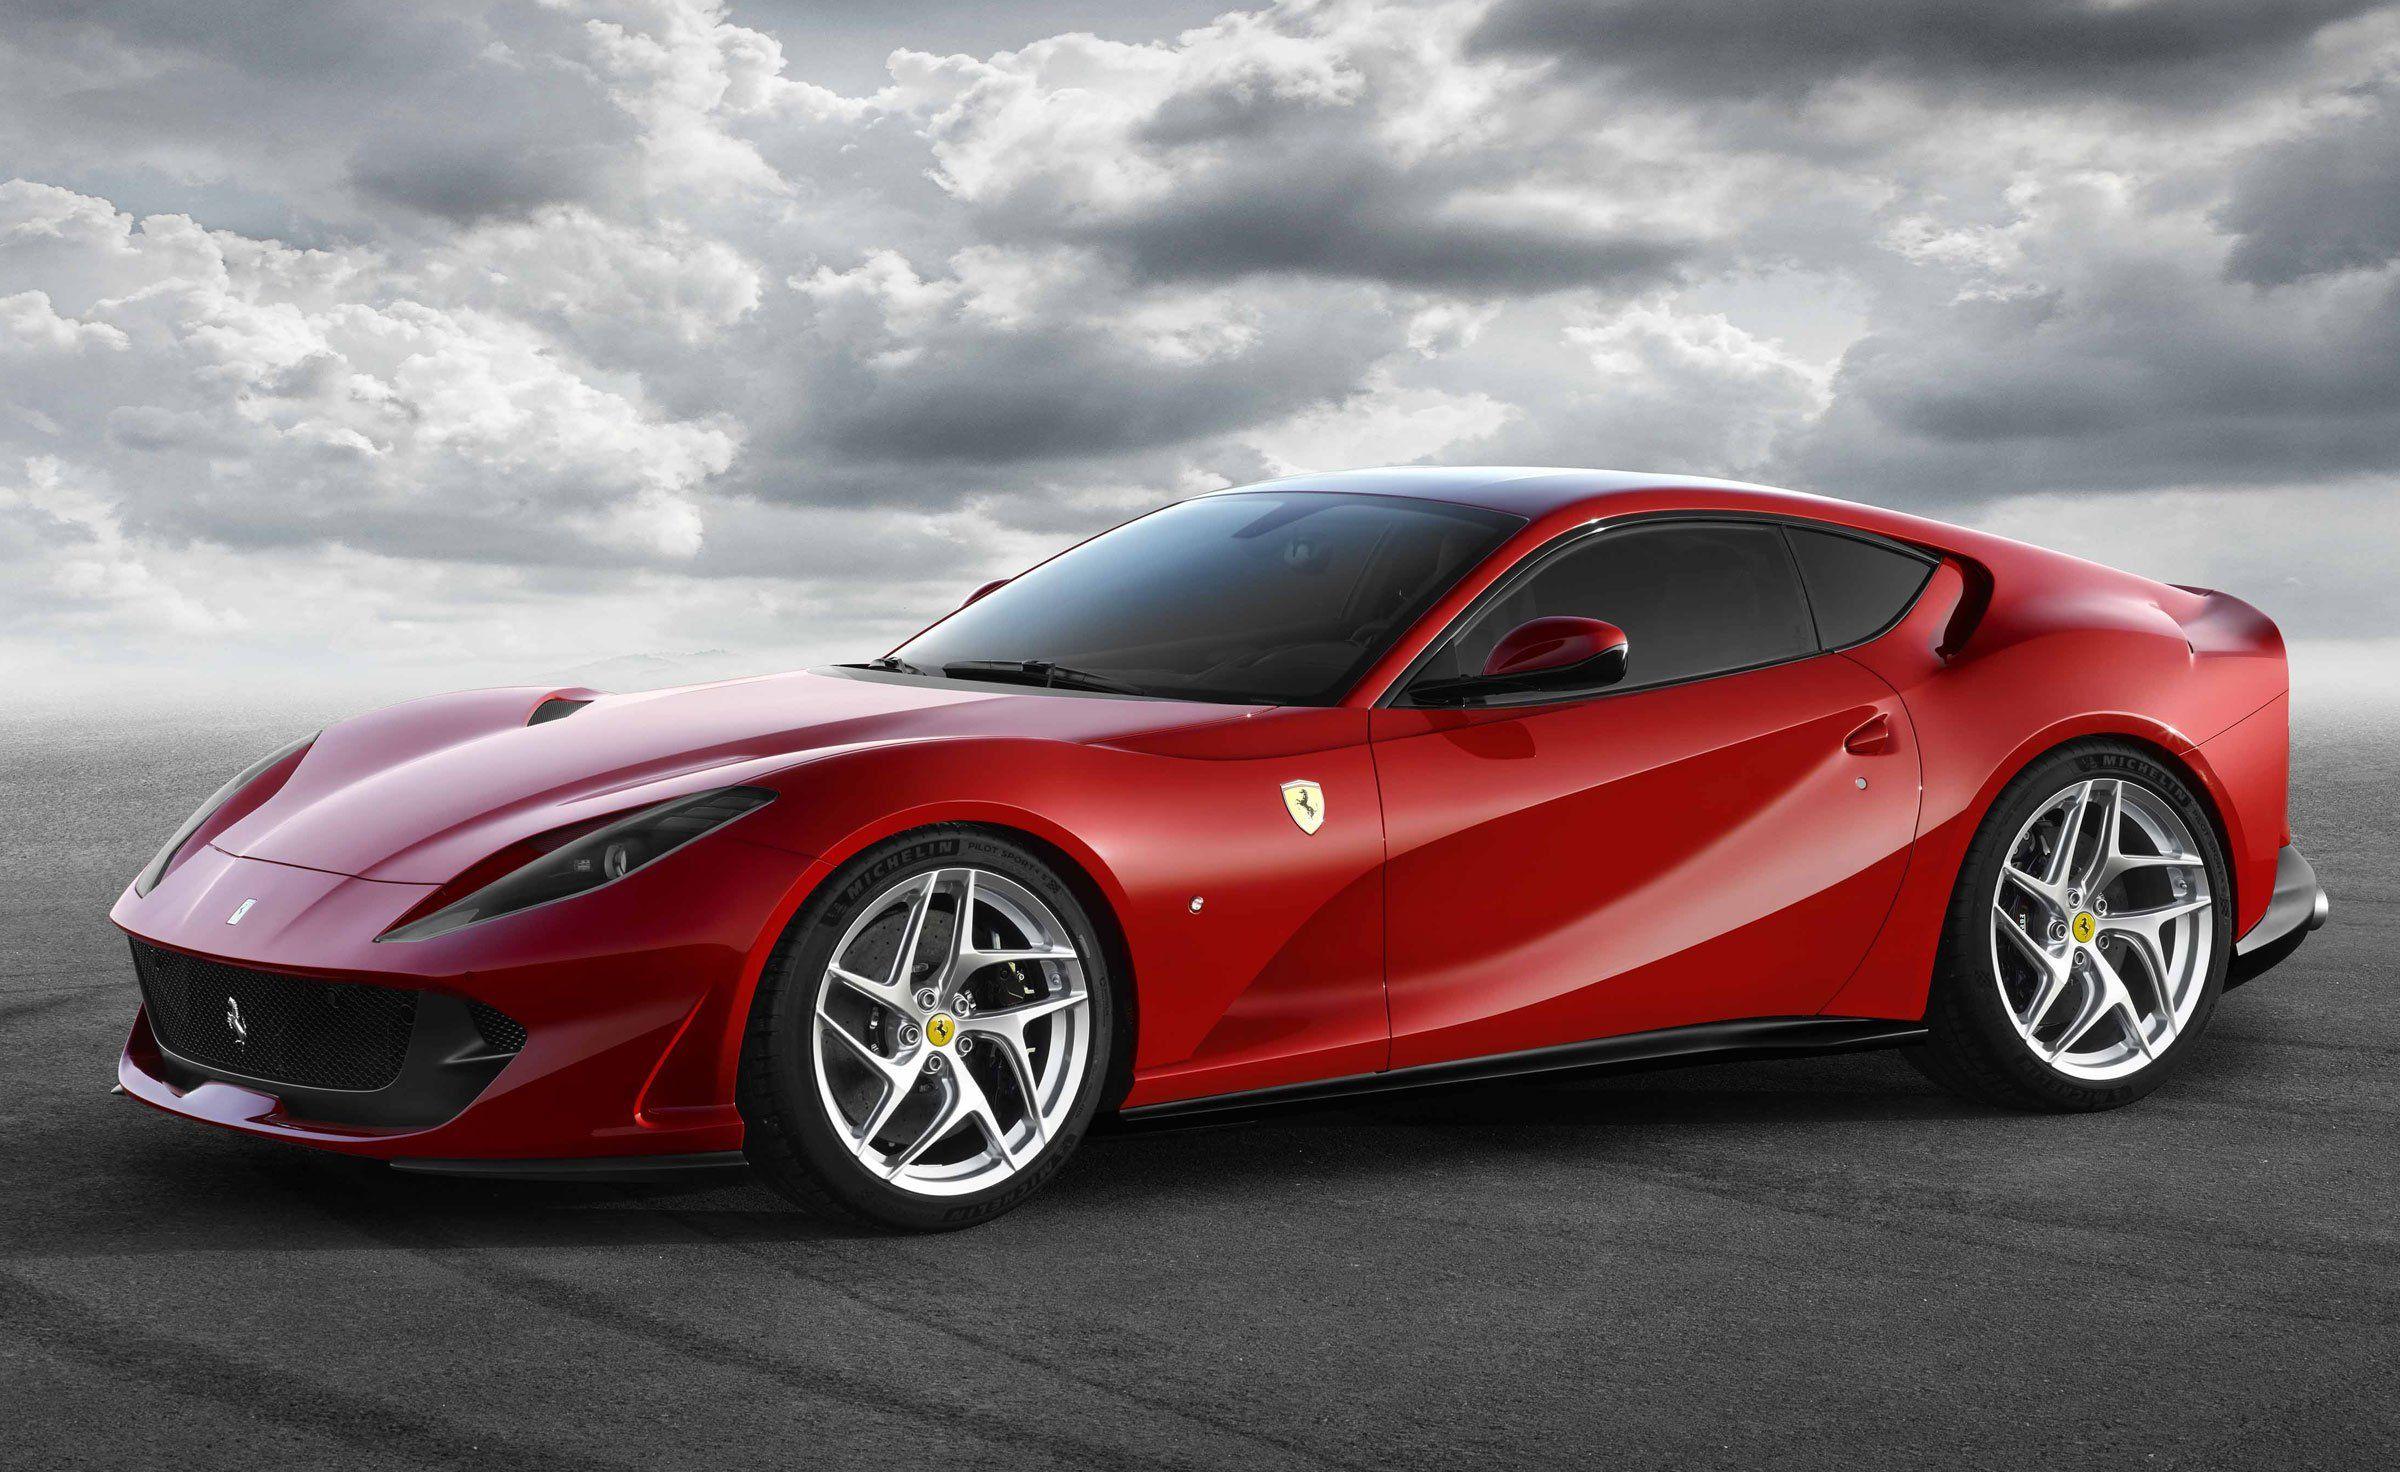 Ferrari 812 Superfast Carros Carros Quentes E Anuncios De Carros